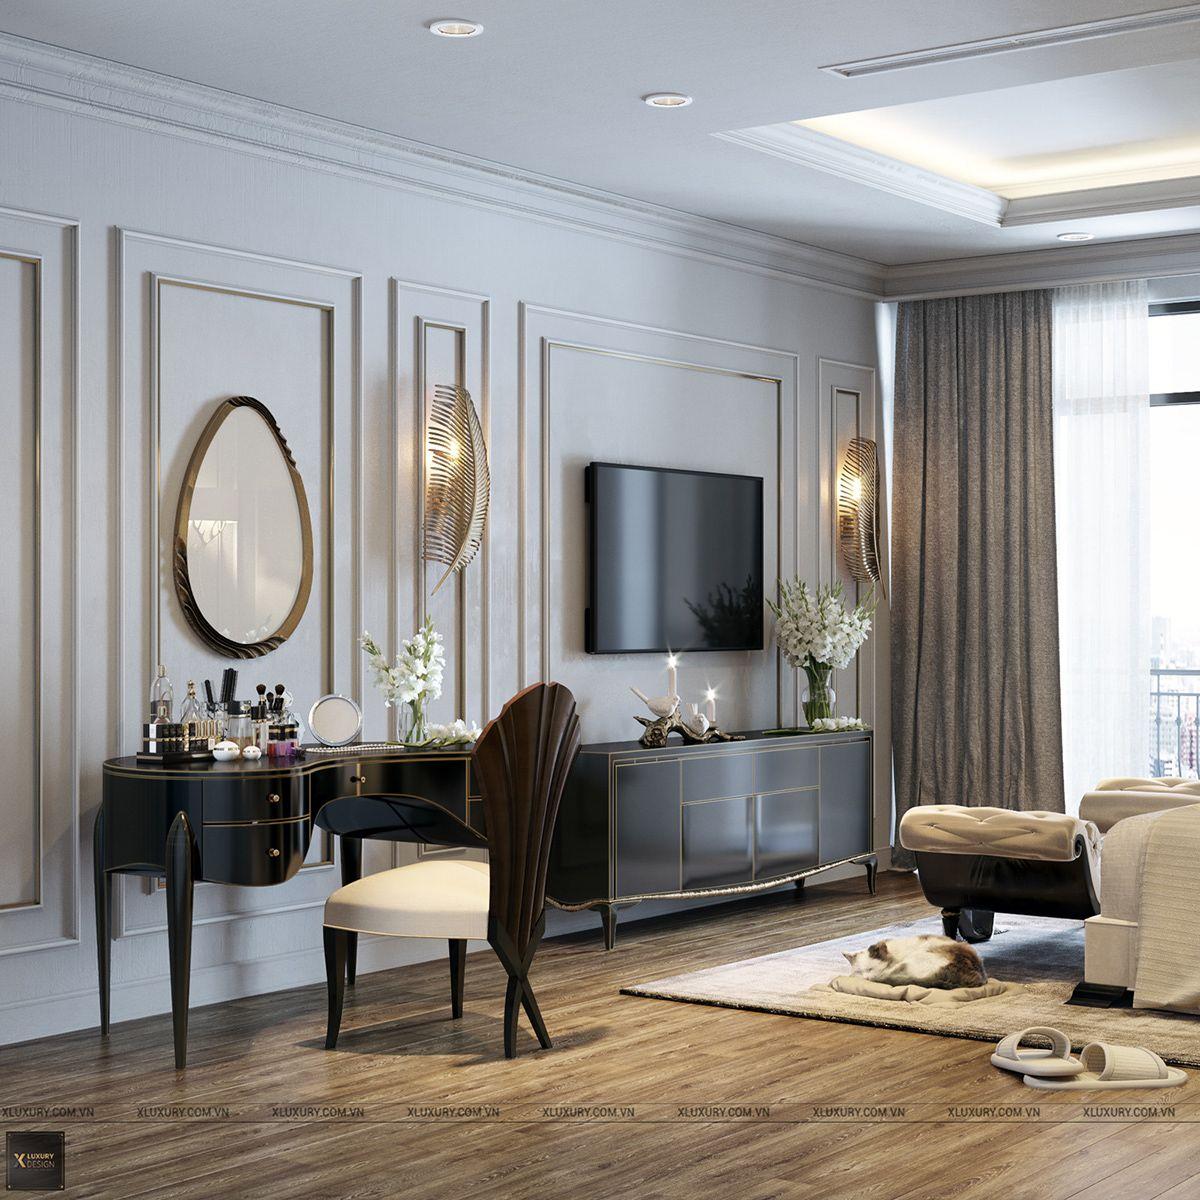 Luxury Master Bedroom Dubai On Behance: Bedroom On Behance In 2020